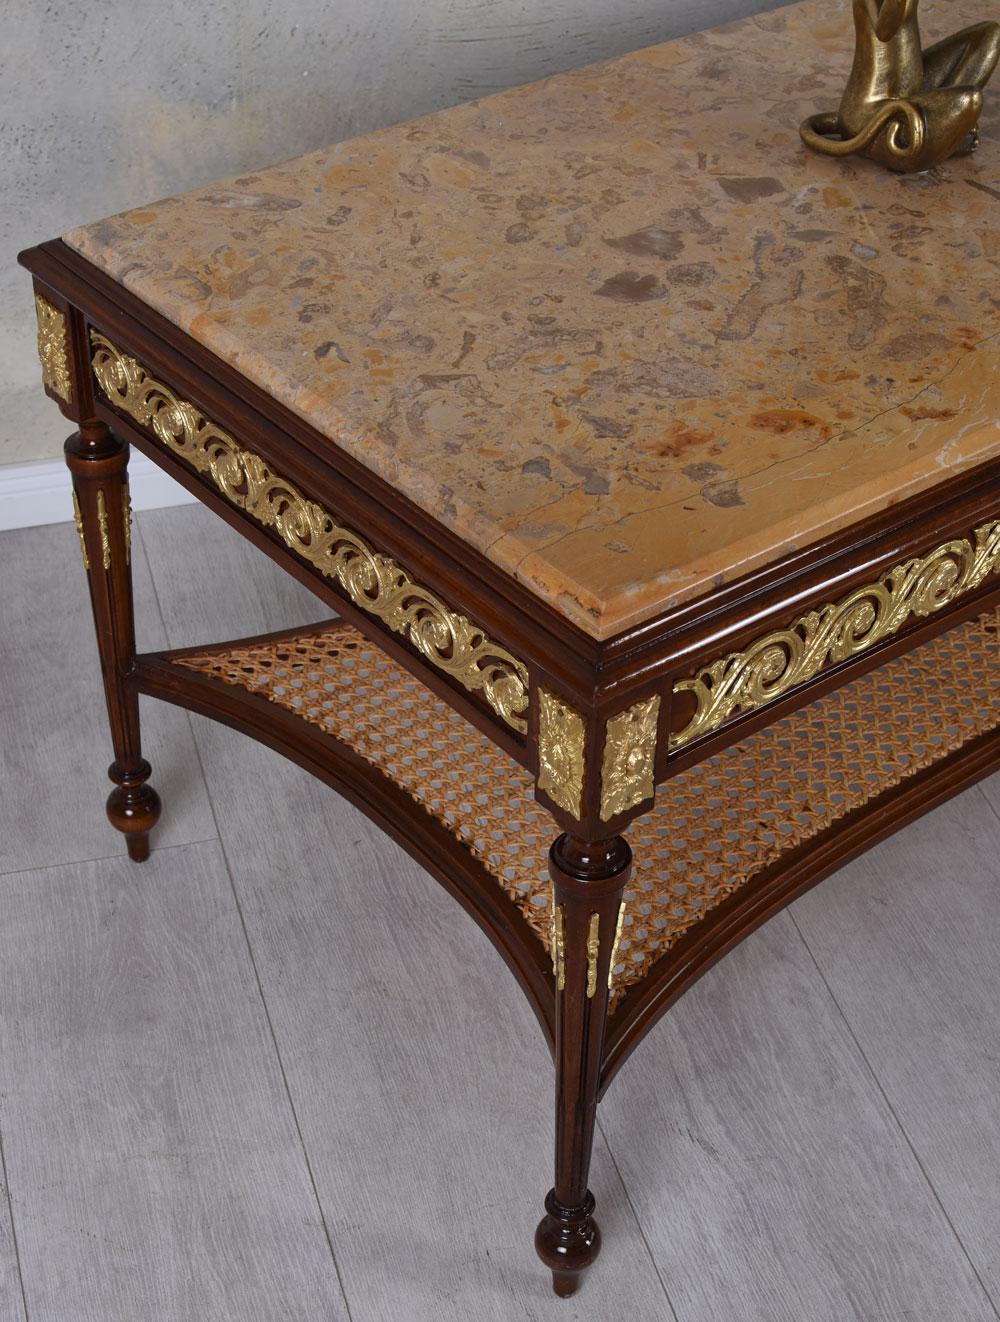 Couchtisch barock tisch marmorplatte wohnzimmertisch antik for Couchtisch marmorplatte